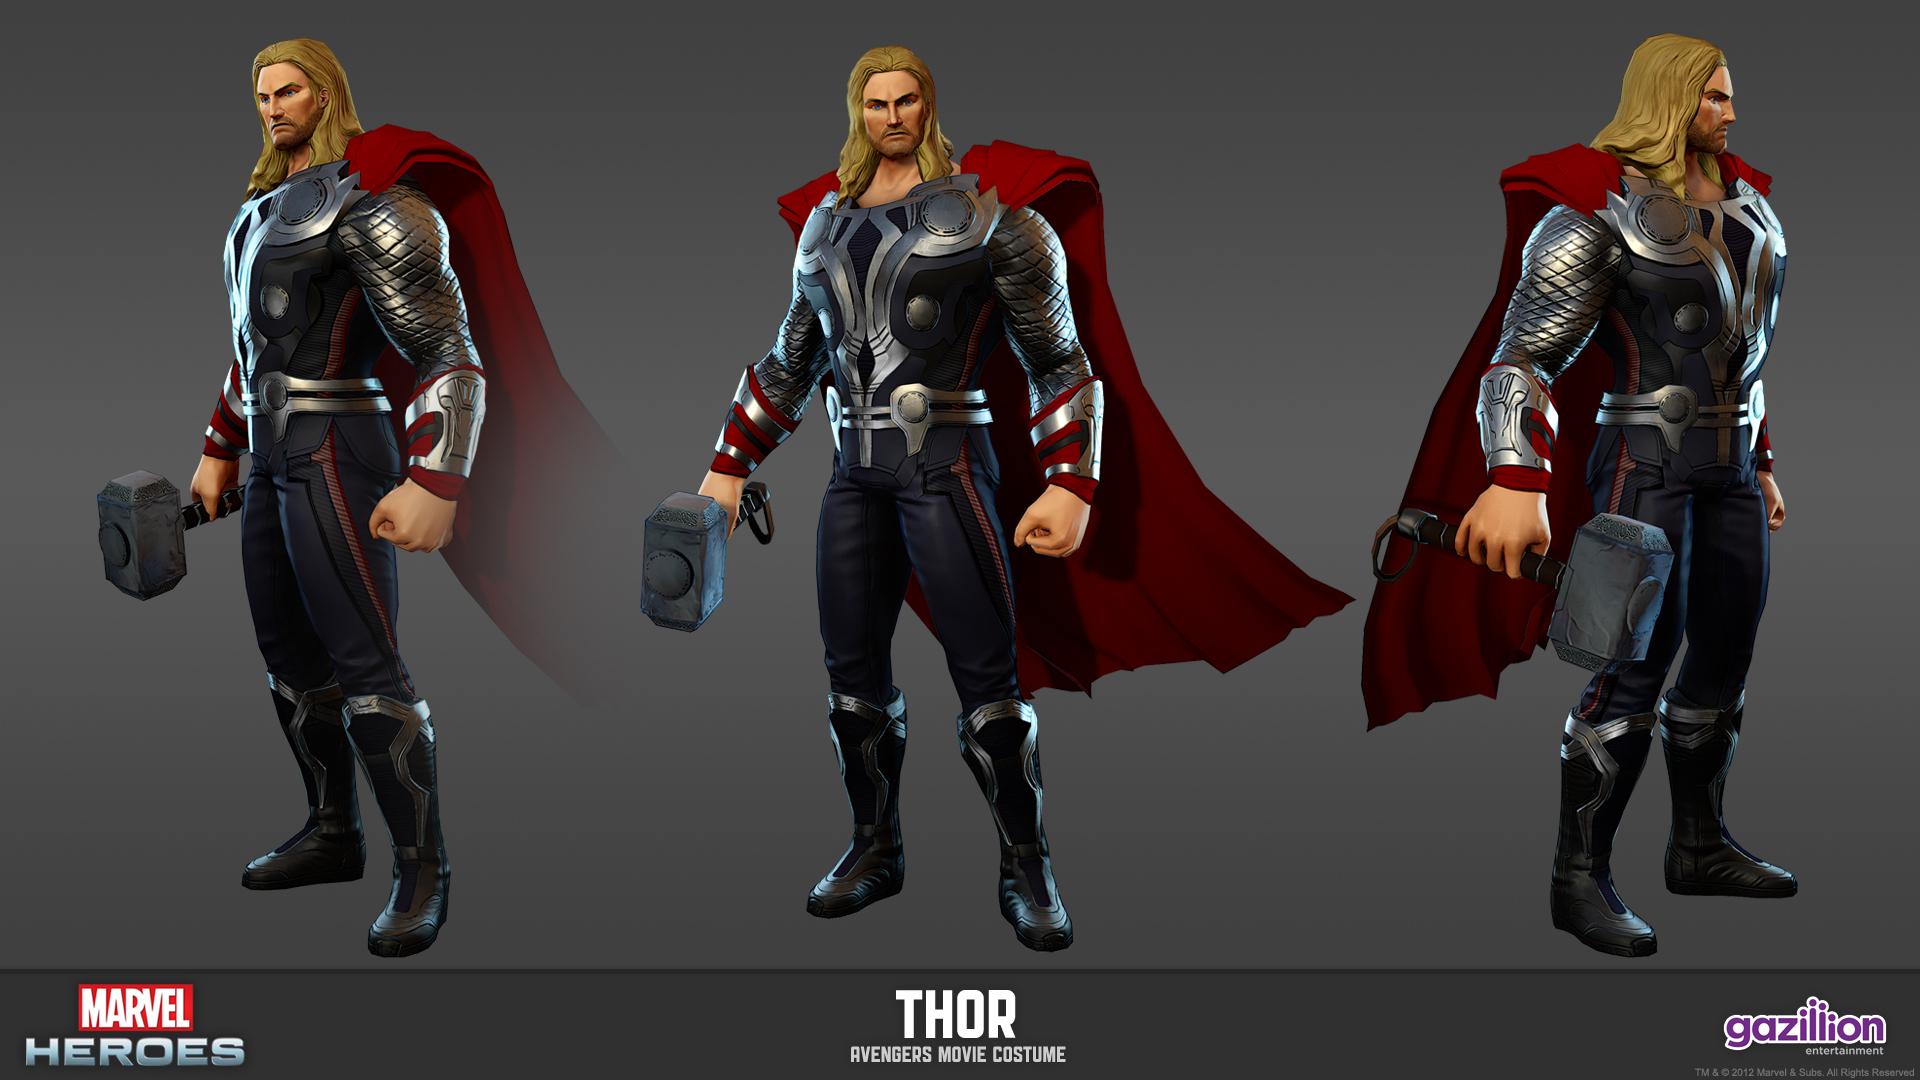 Vga naar hdmi converter furthermore marvel heroes game characters in